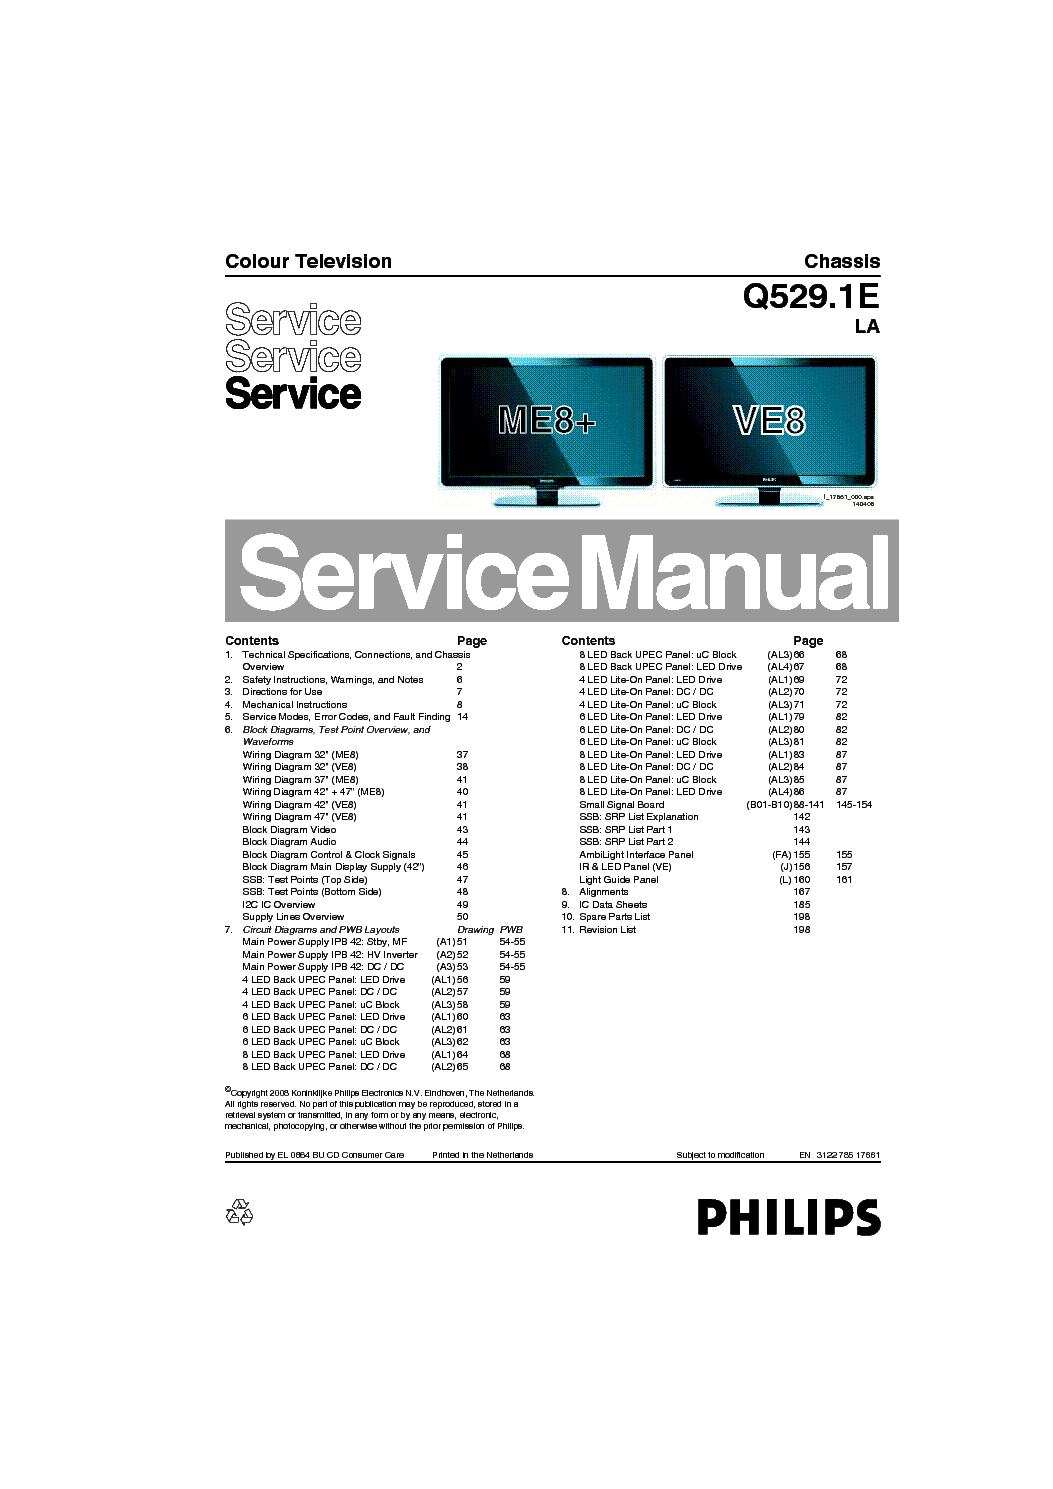 PHILIPS 37PFL9603D CHASSIS Q529.1E-LA SM service manual (1st page)